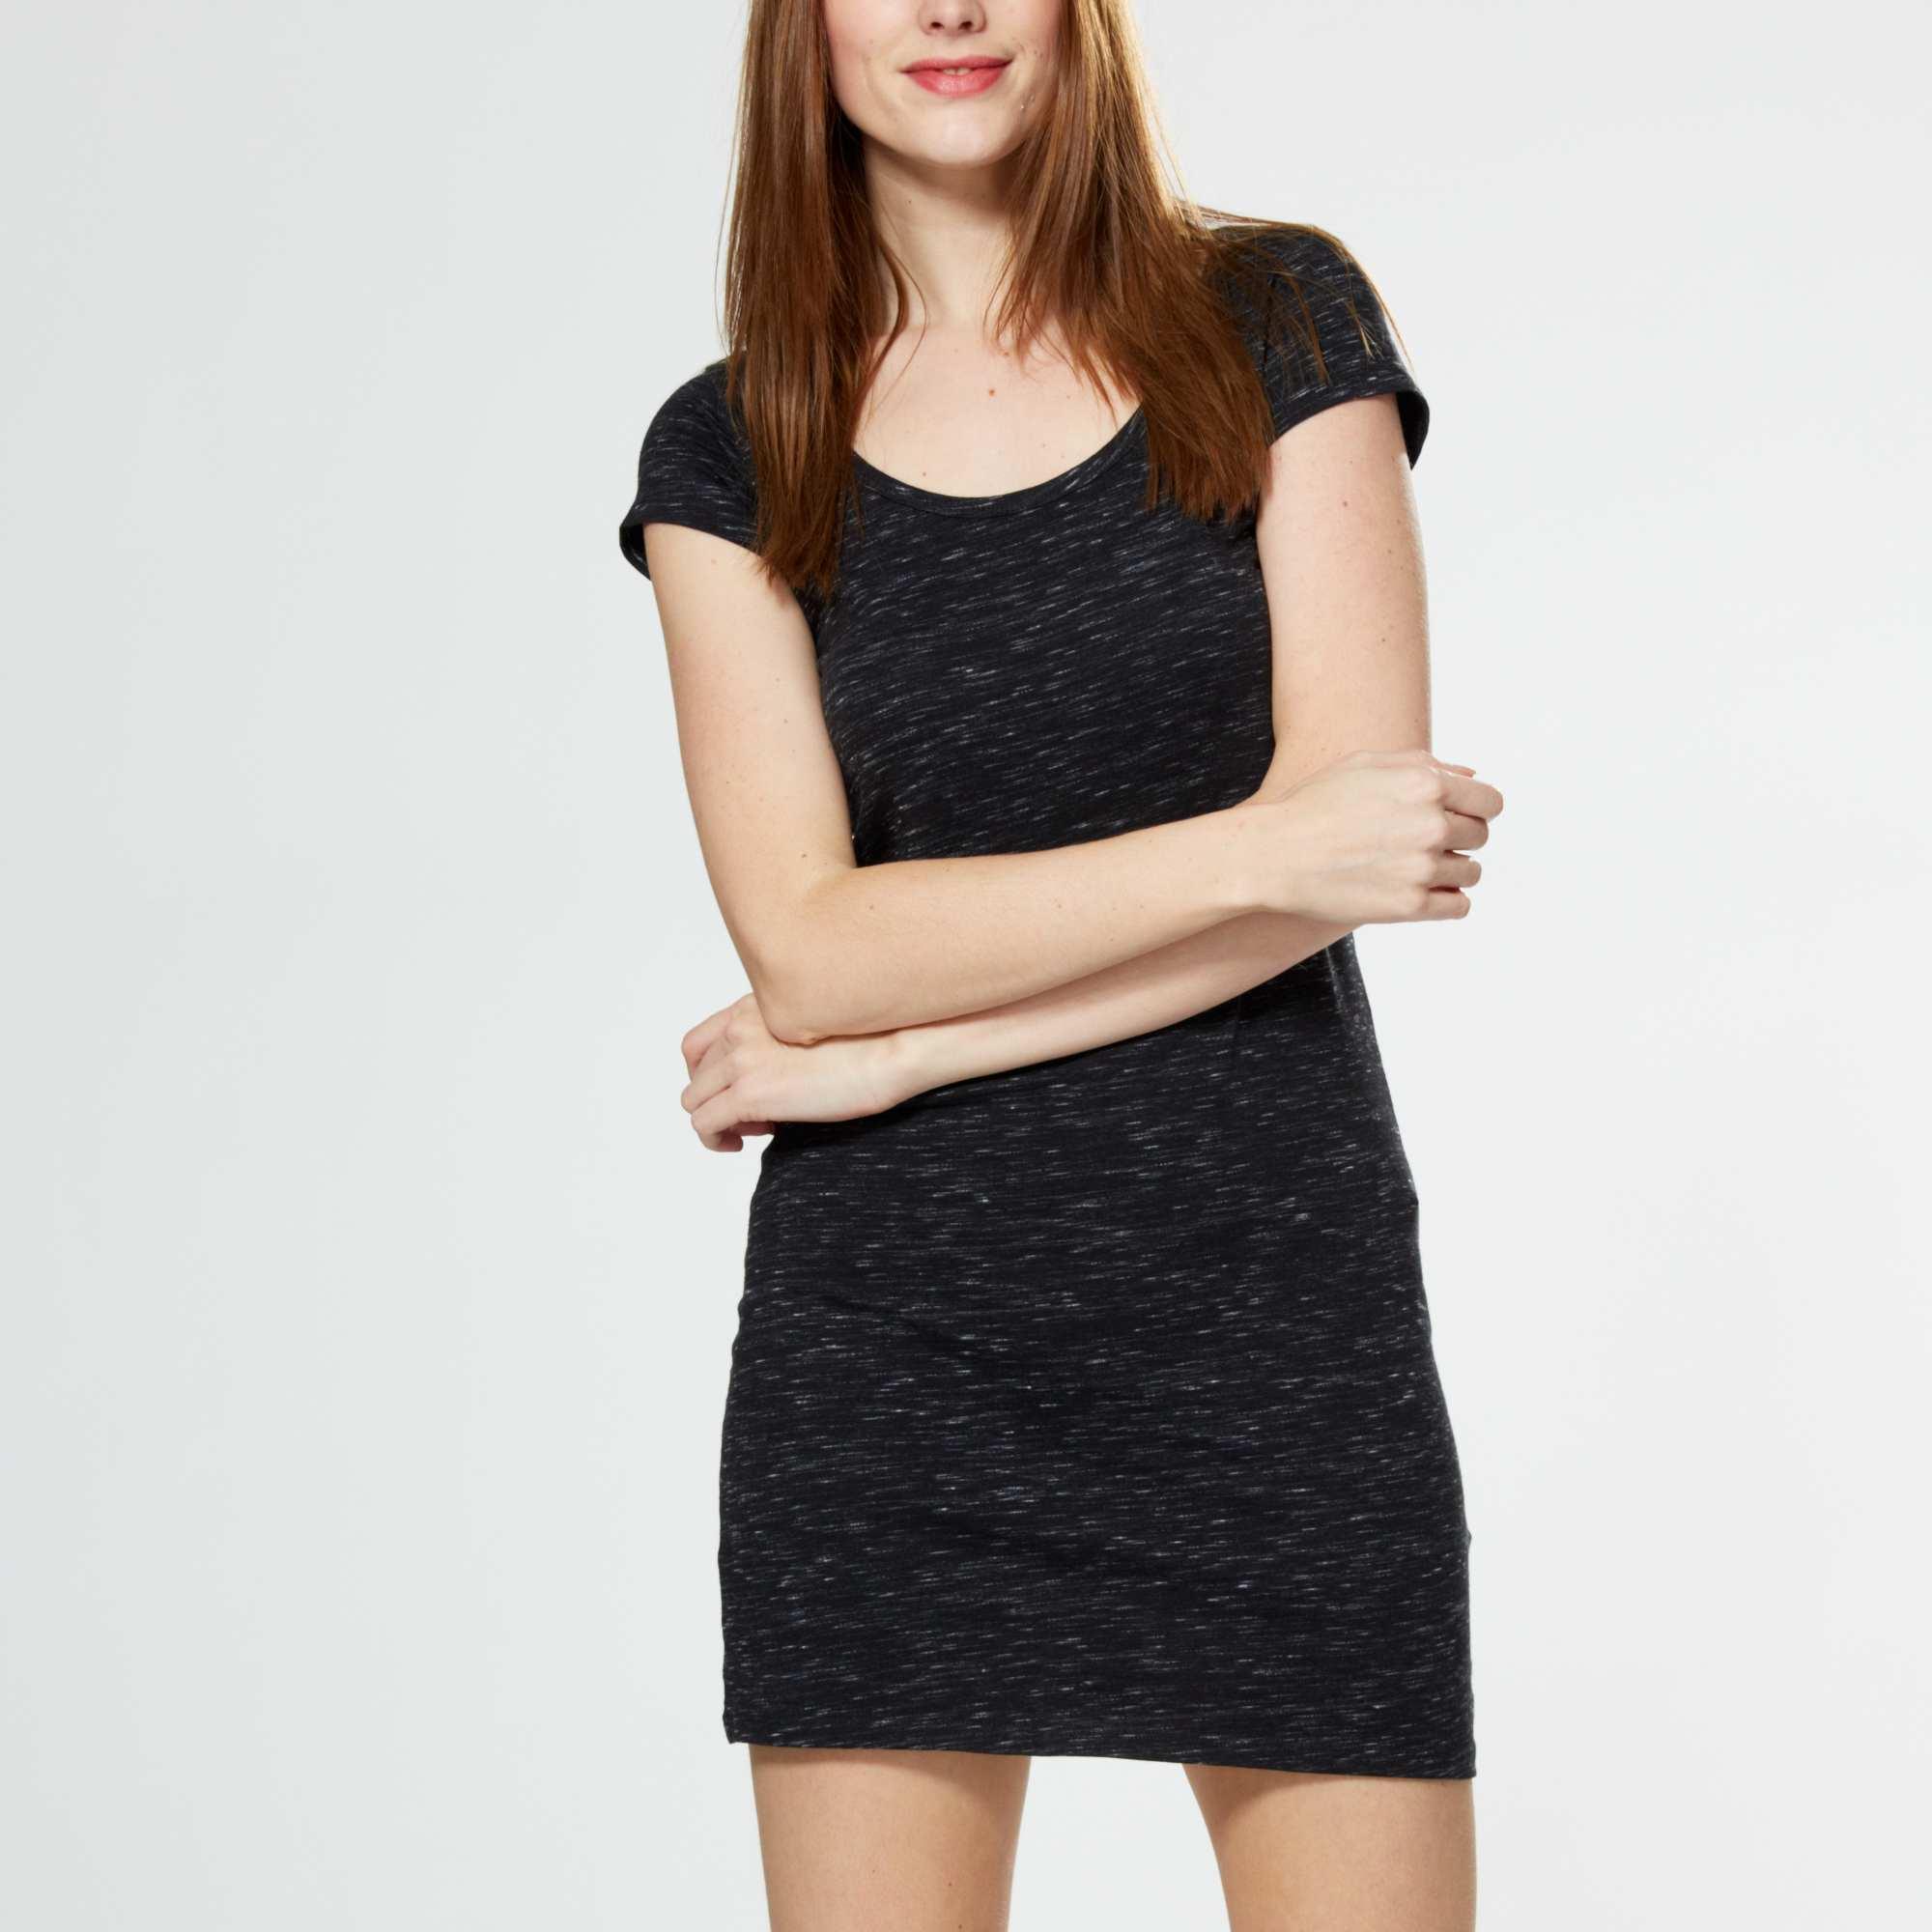 robe tee shirt femme kiabi 8 00. Black Bedroom Furniture Sets. Home Design Ideas